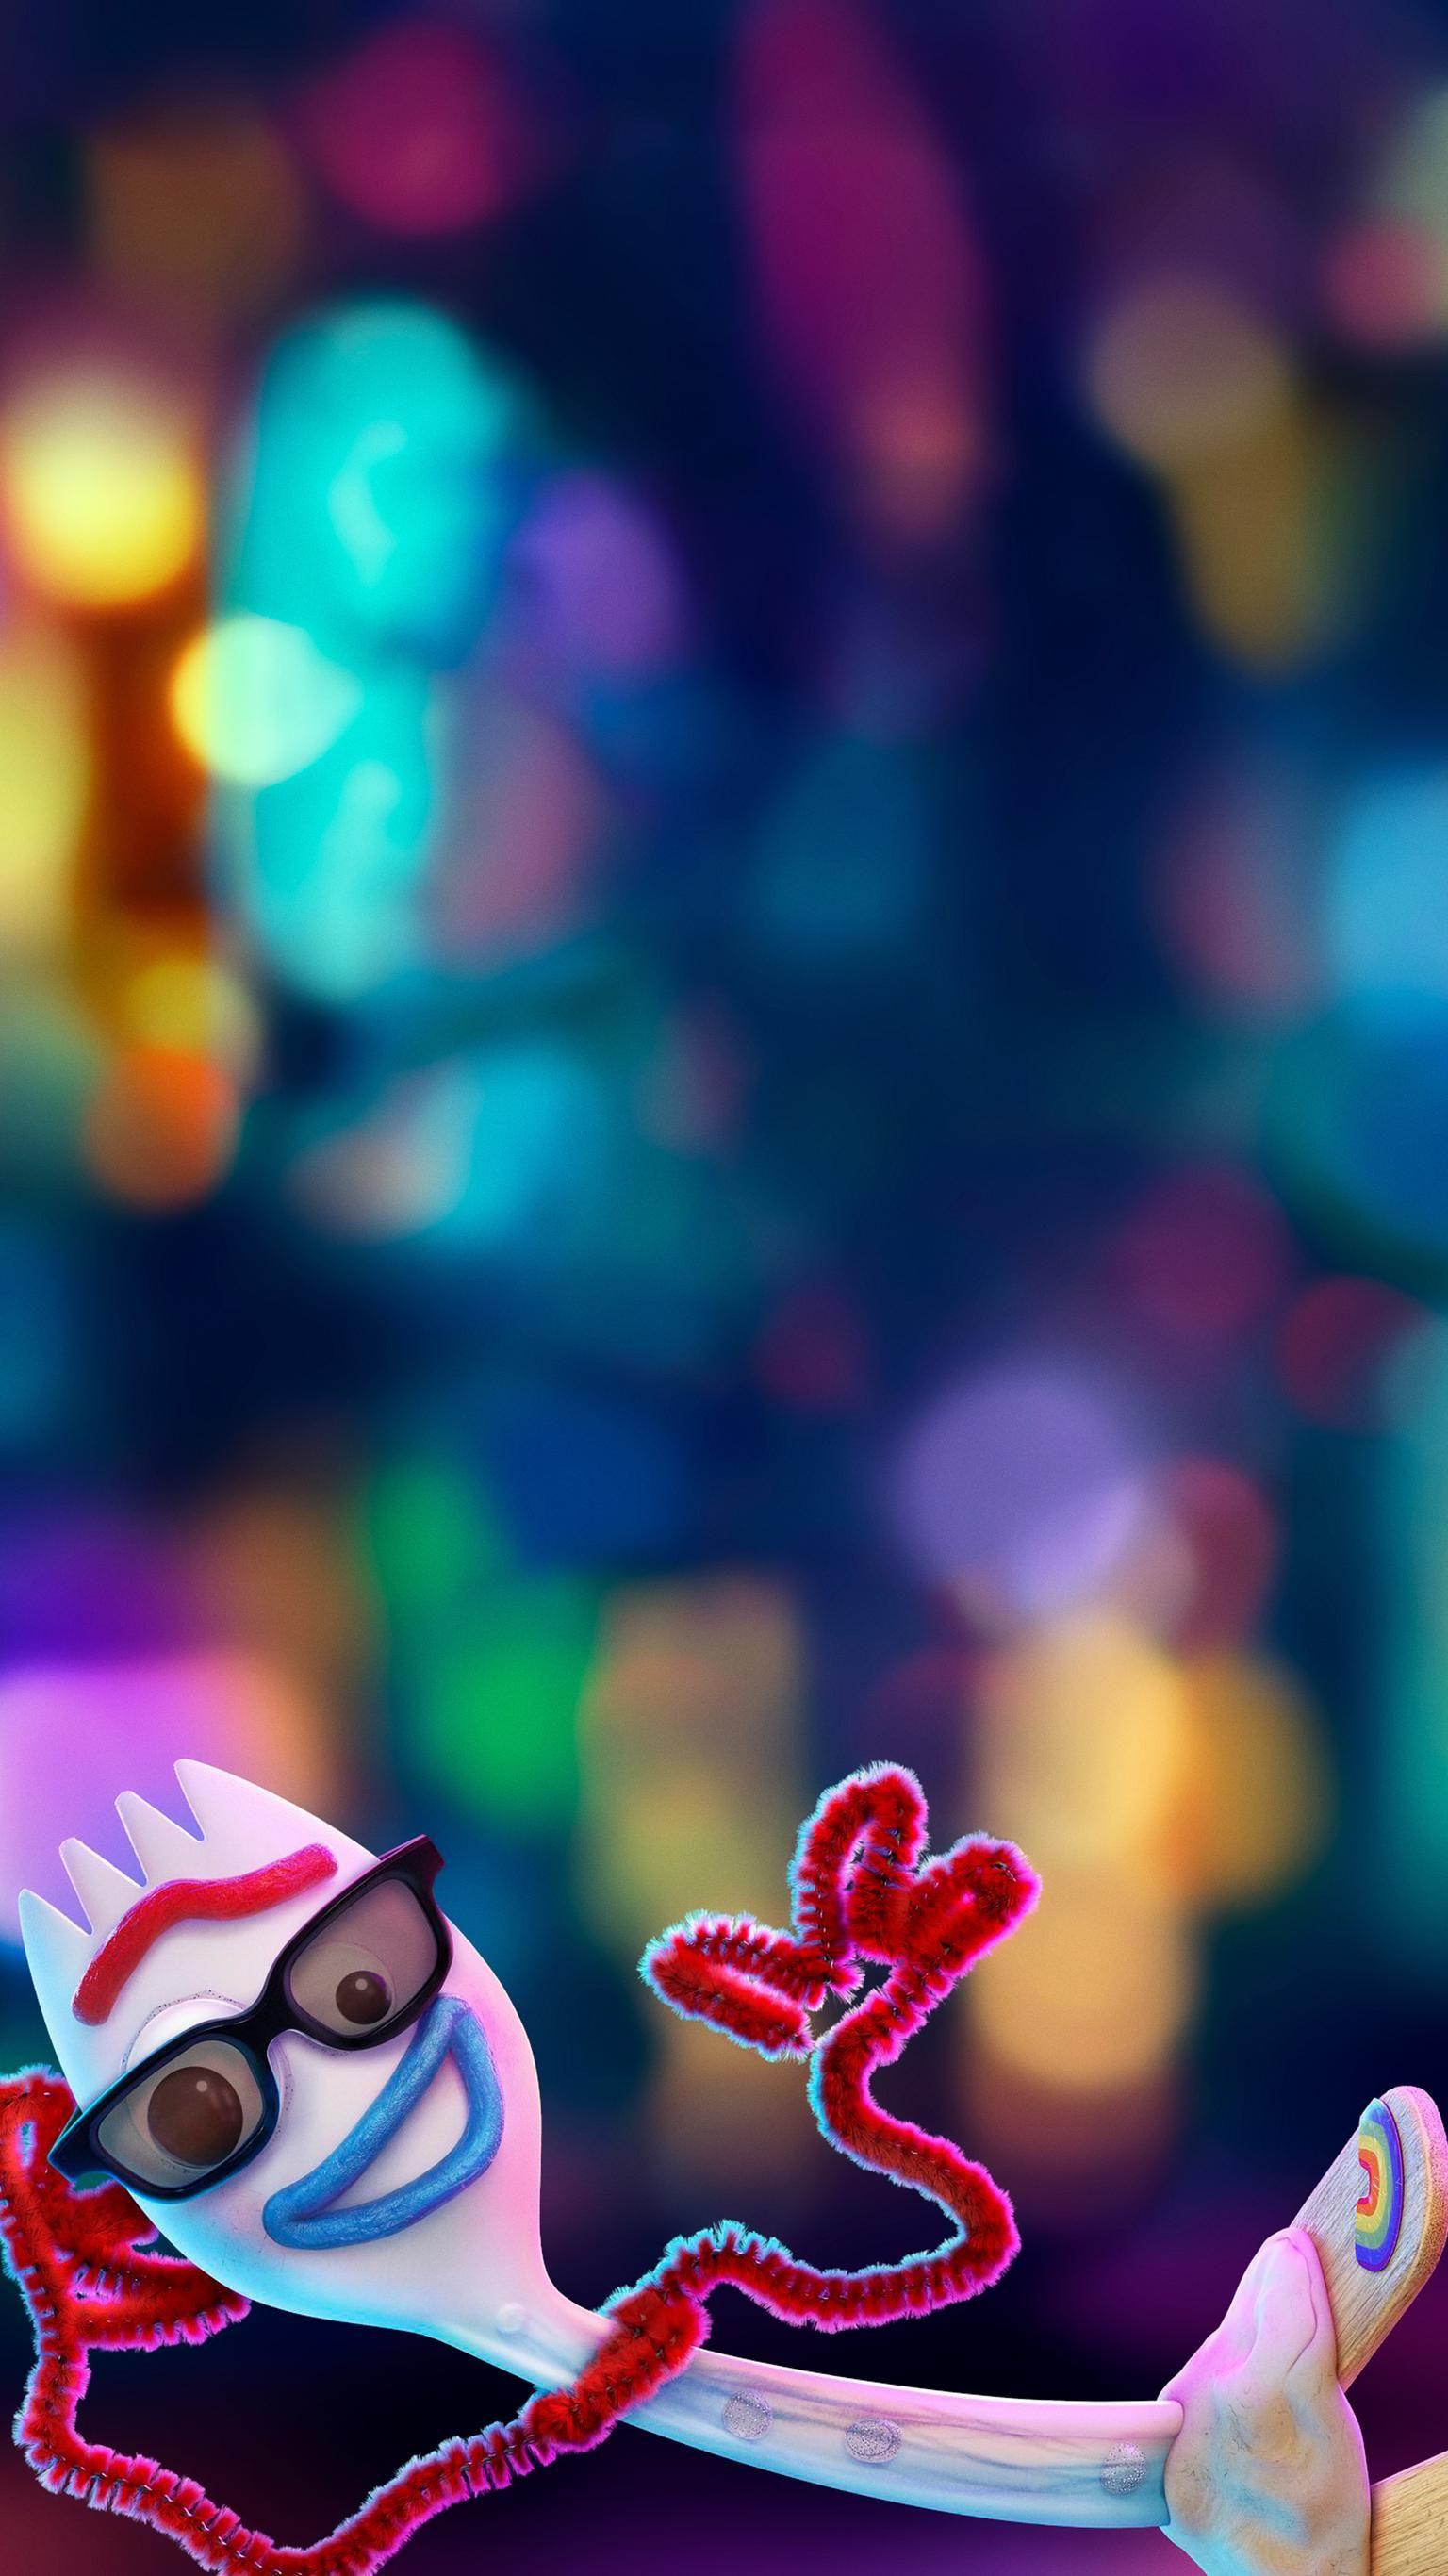 Cute Disney Wallpaper Minnie Mouse Cute Desktop Wallpaper Black Love Mickey Mouse Drawings Mickey Mouse Wallpaper Mickey Mouse Wallpaper Iphone